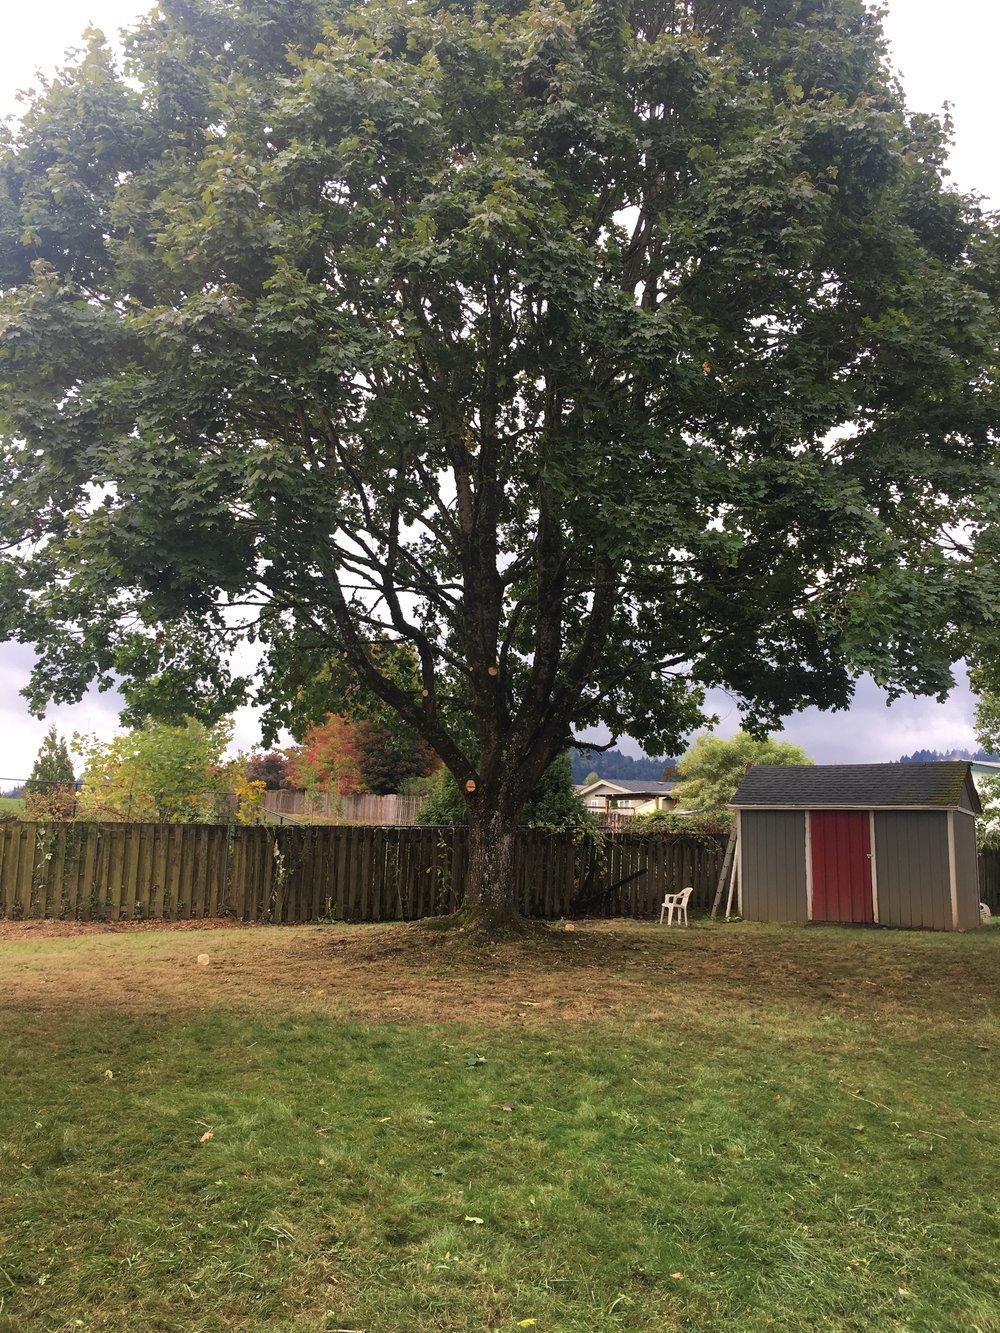 formal tree pruning